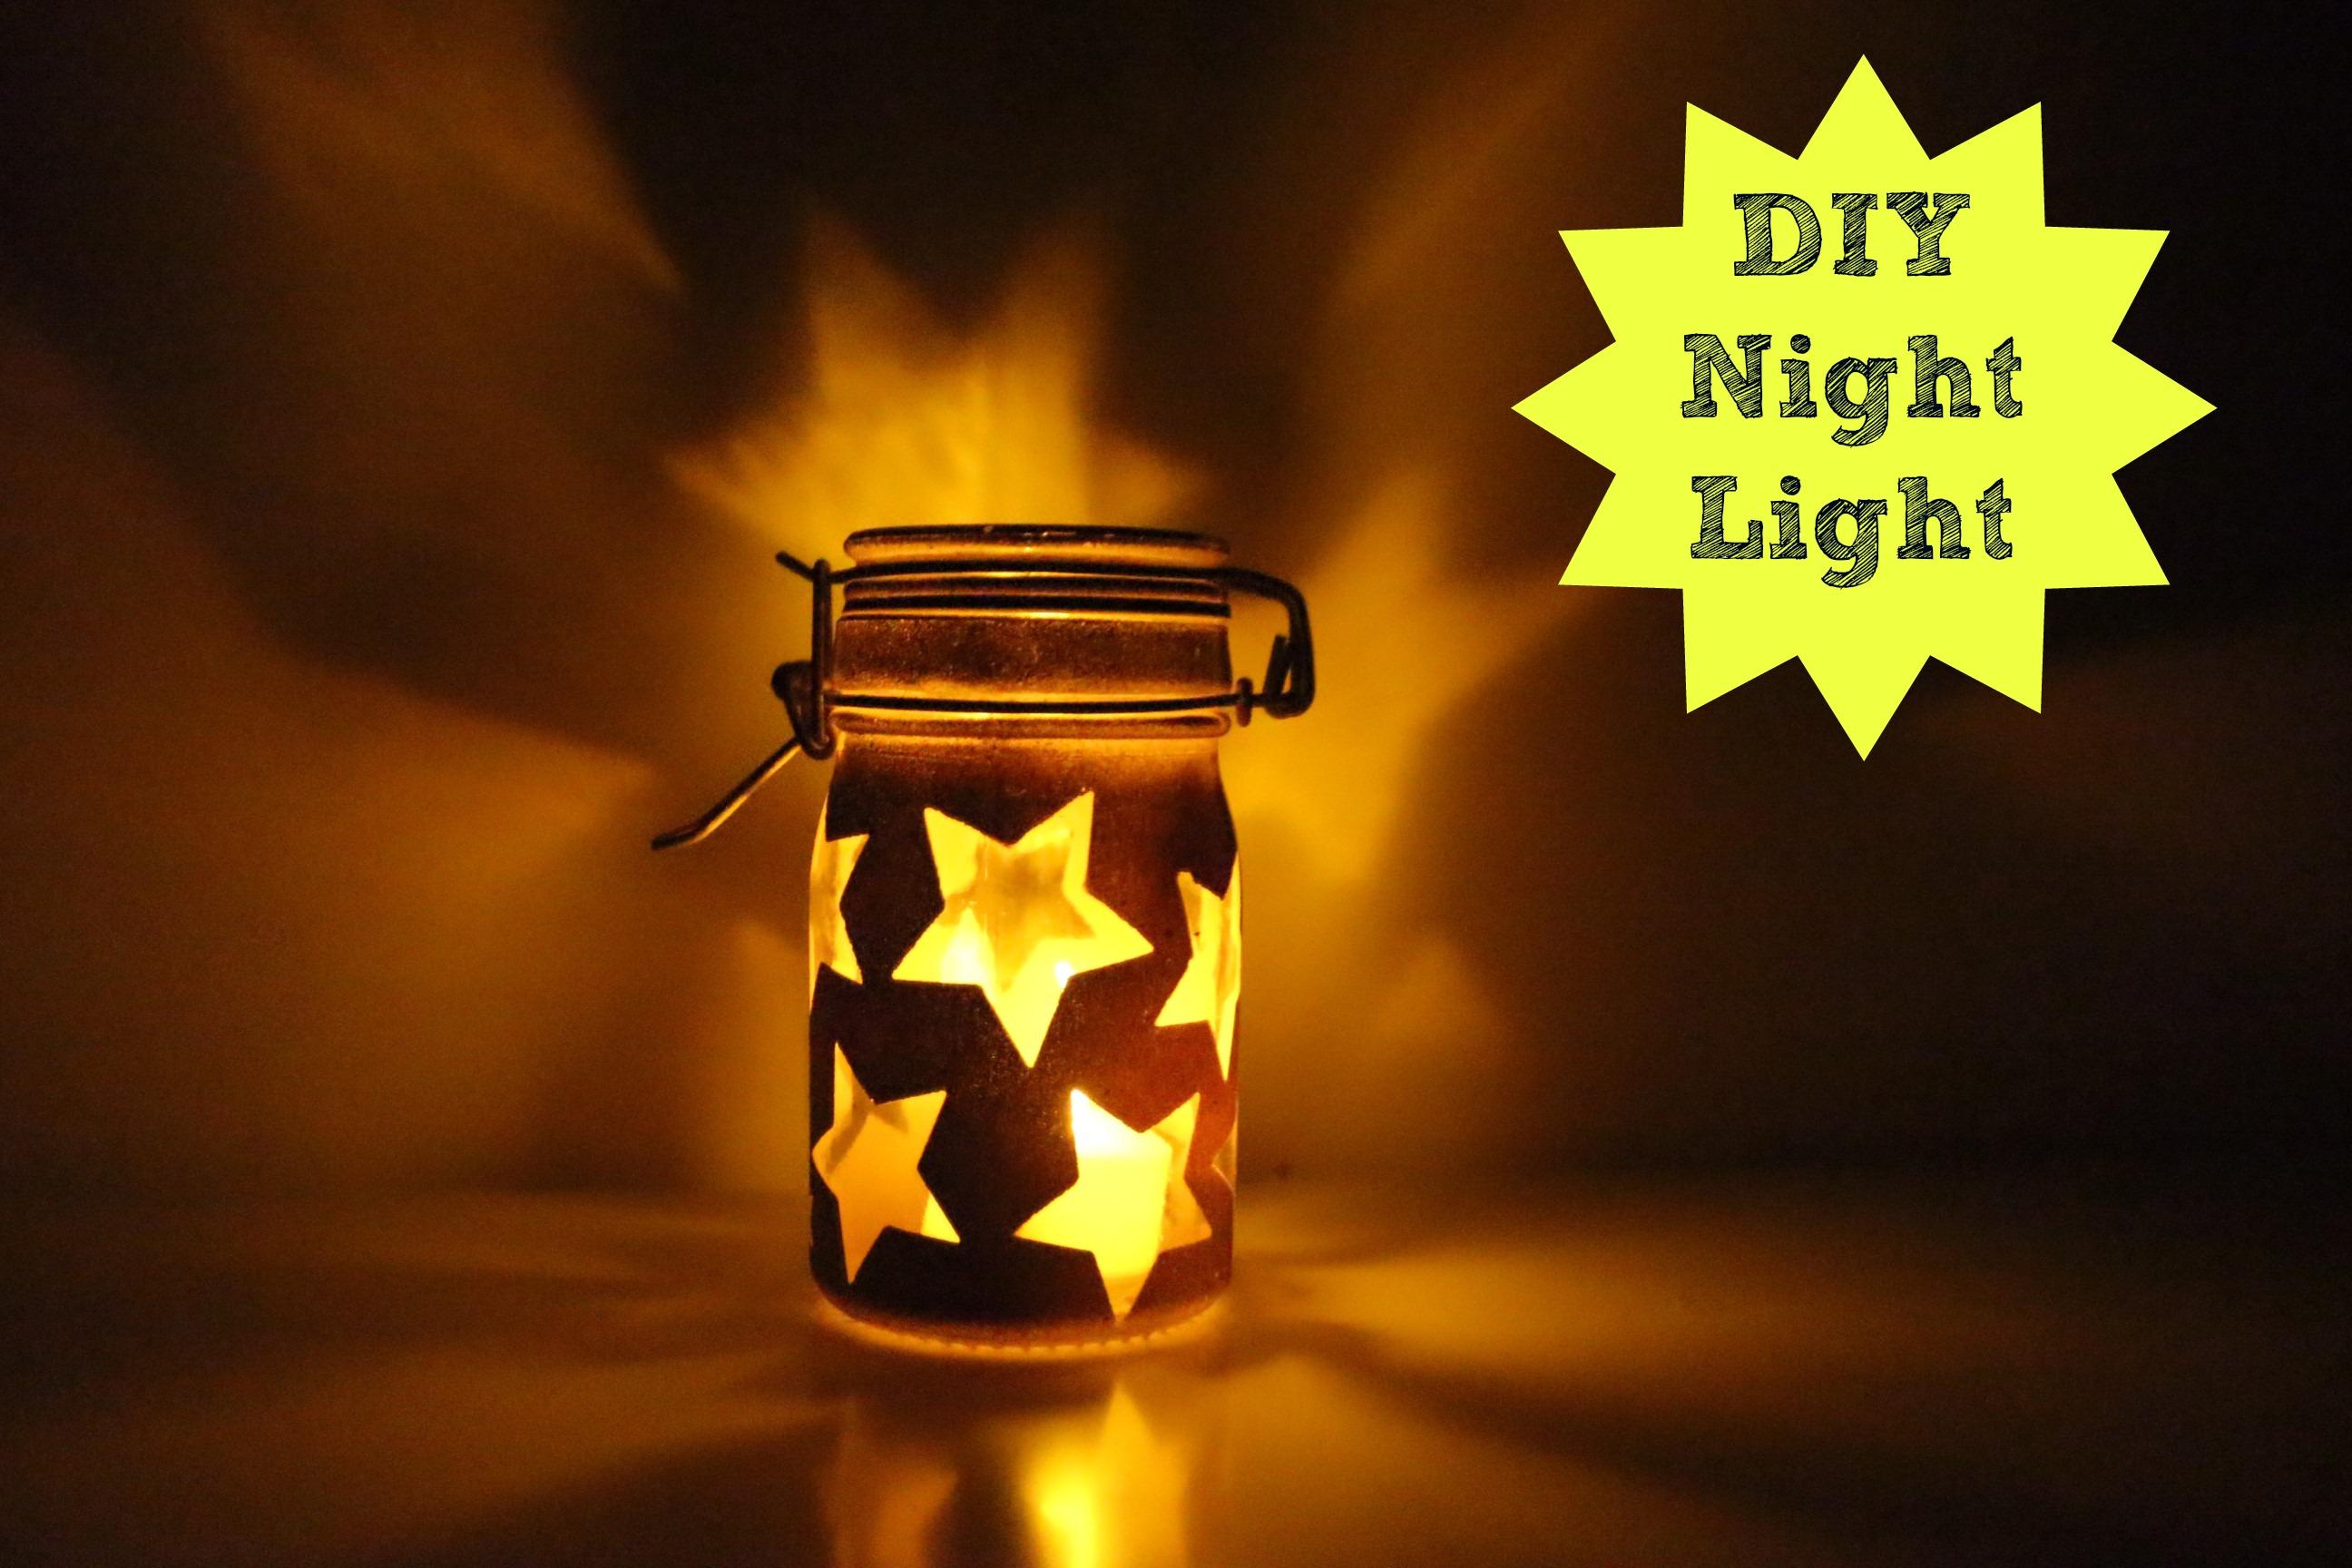 Diy Night Light